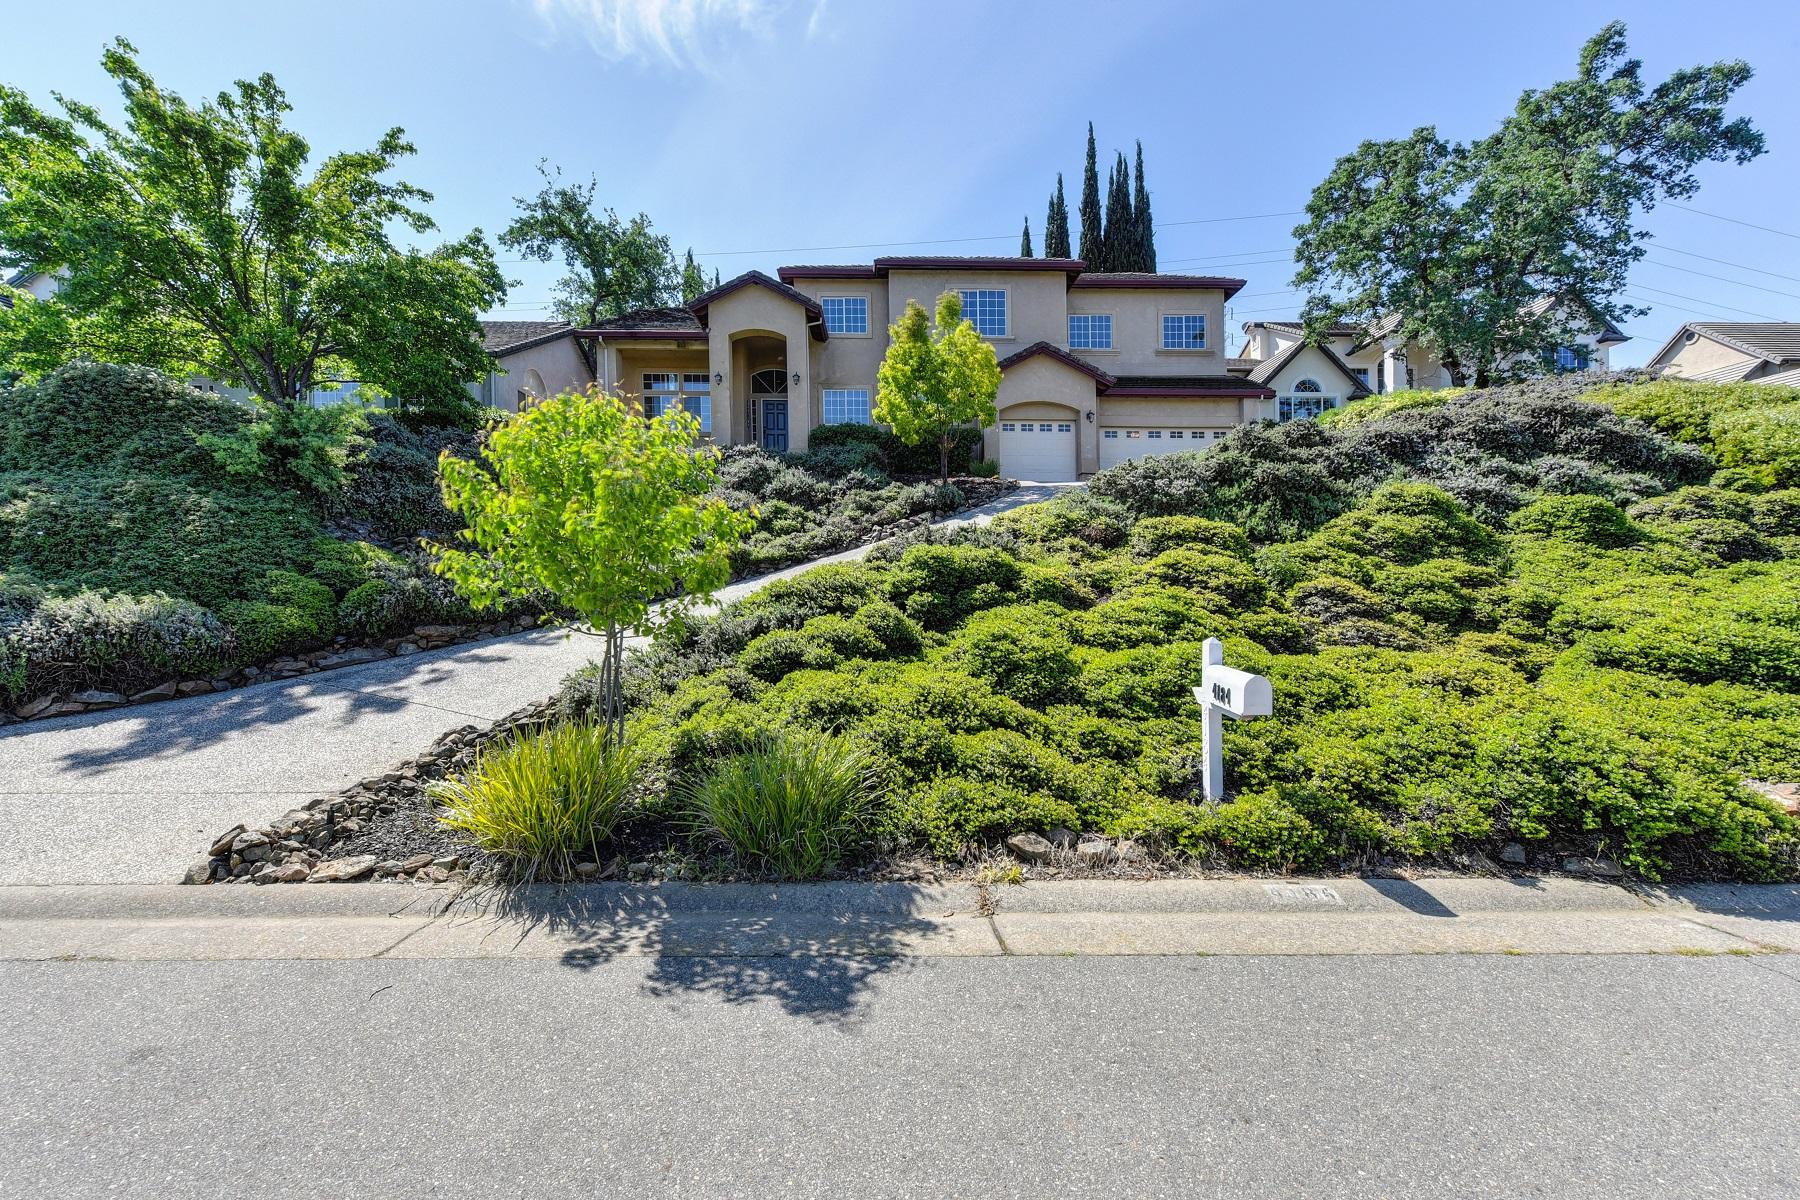 Single Family Home for Sale at 4184 Hensley Circle, El Dorado Hills, CA 95762 El Dorado Hills, California 95762 United States